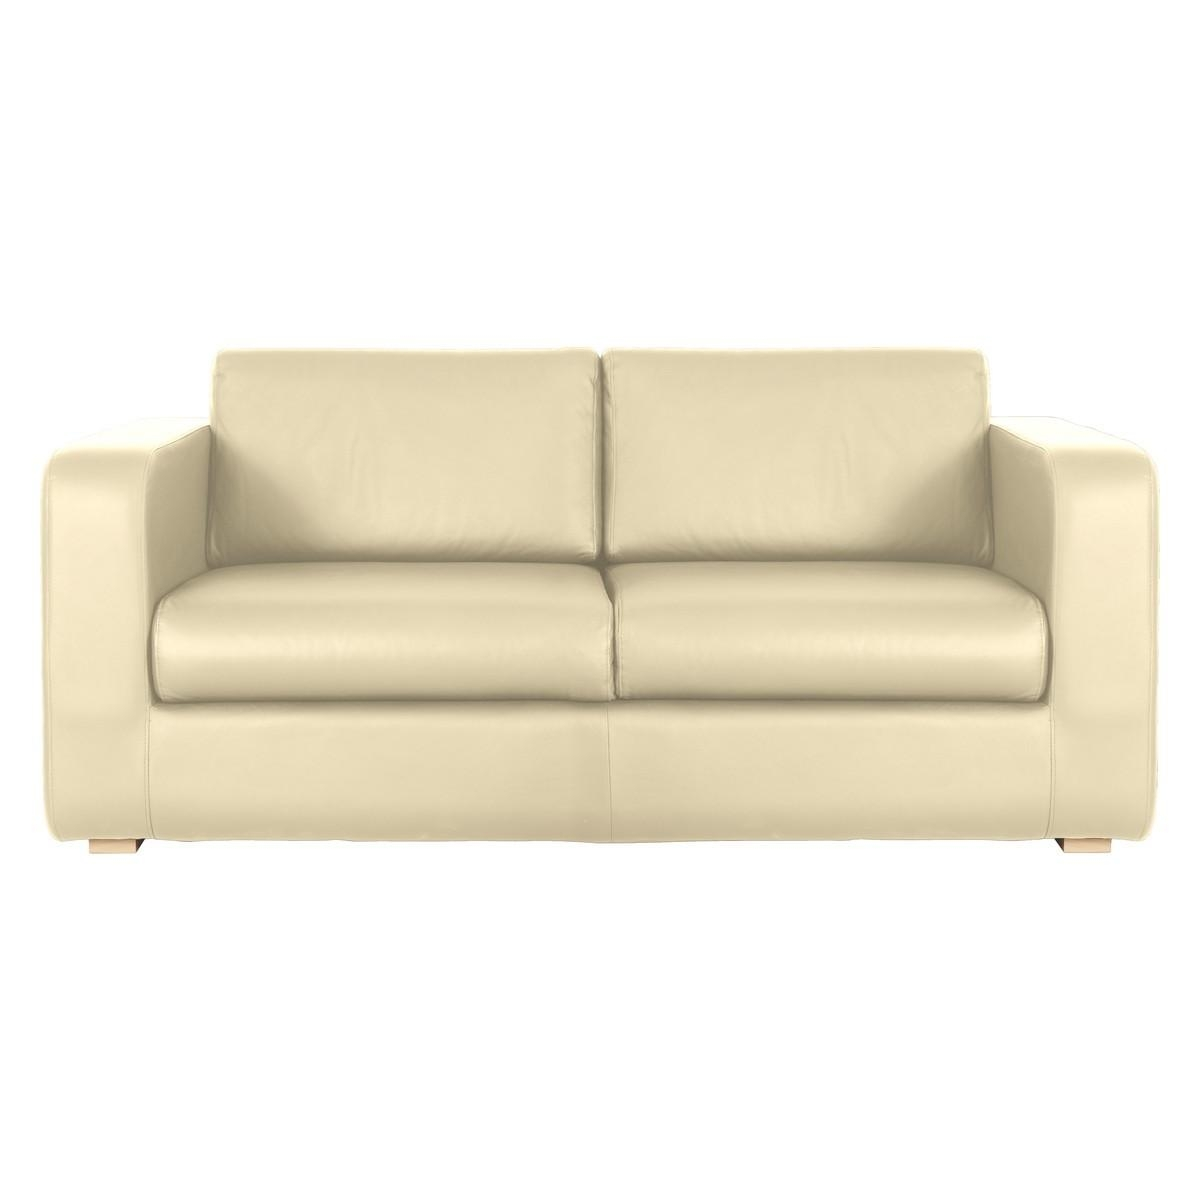 buy sofa uk set blue color 20 best ideas three seater sofas